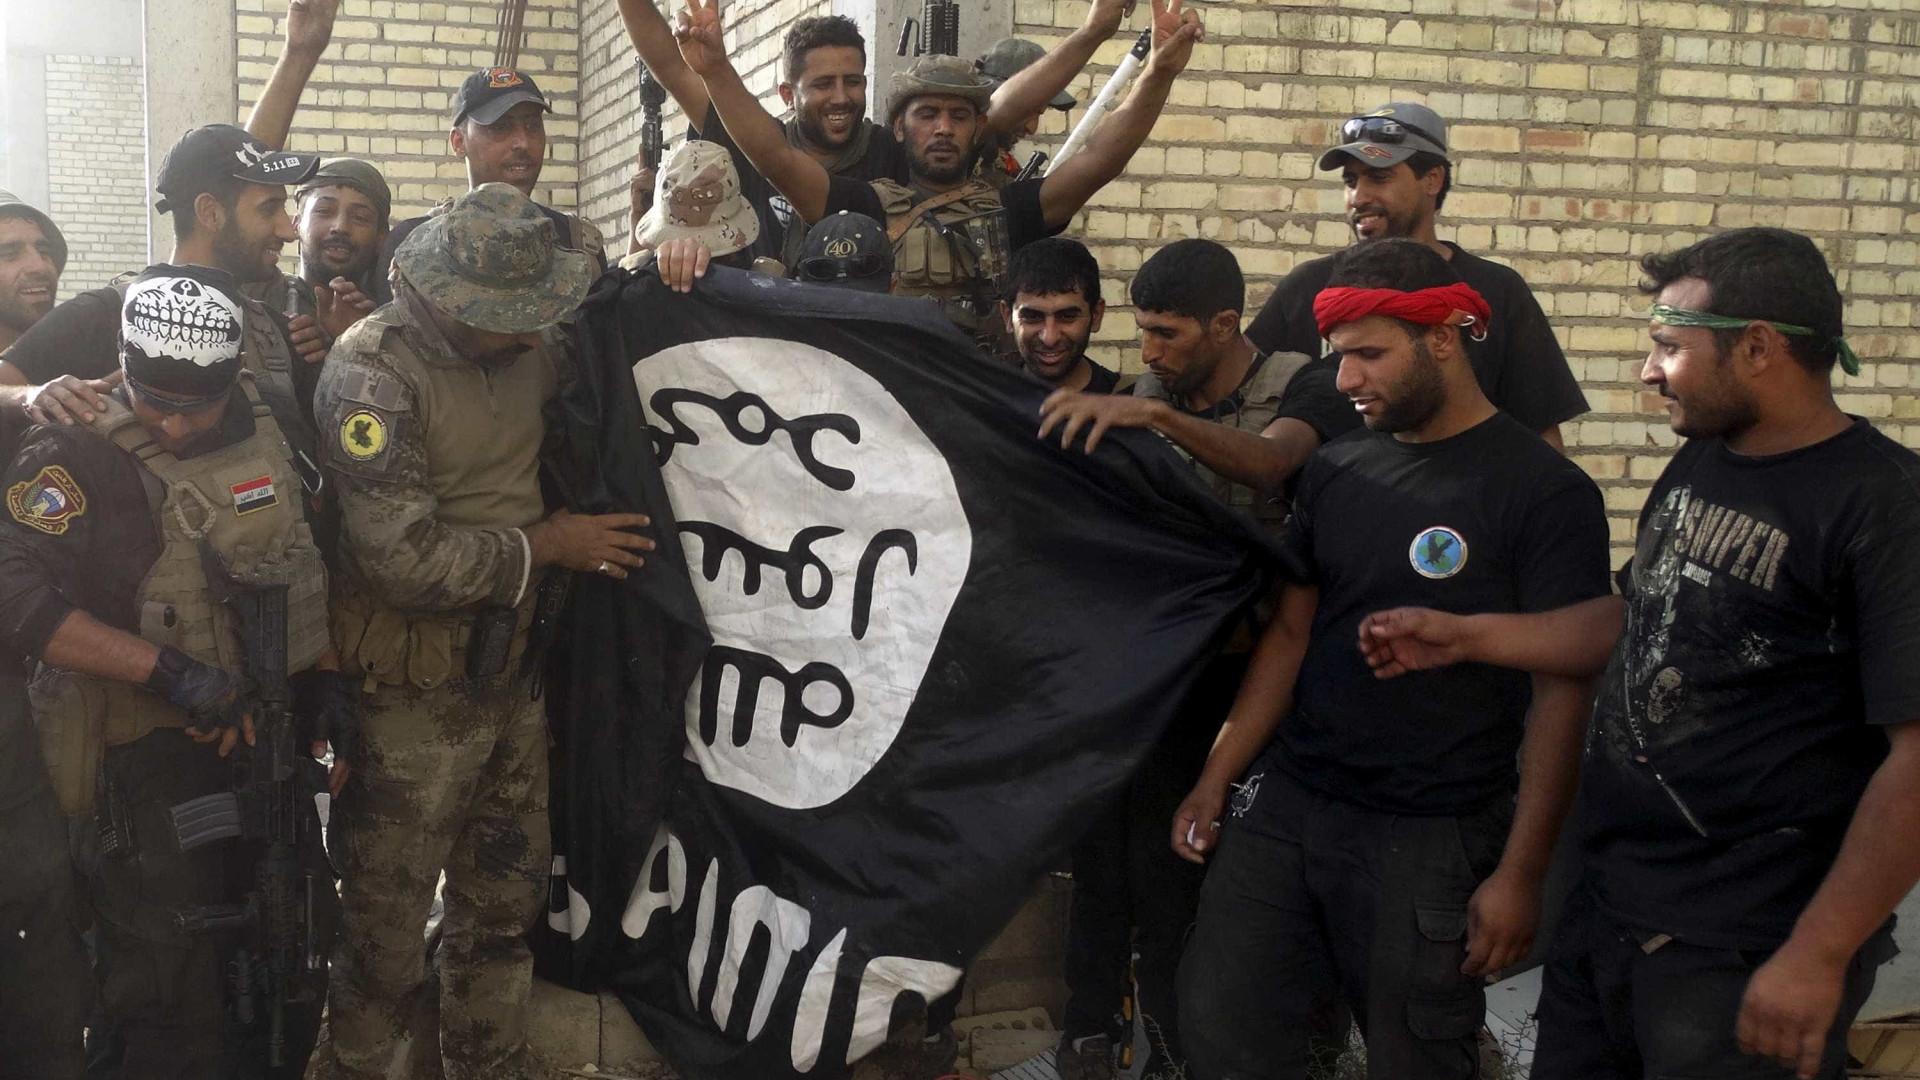 Estado Islâmico executa 19 civis na Síria